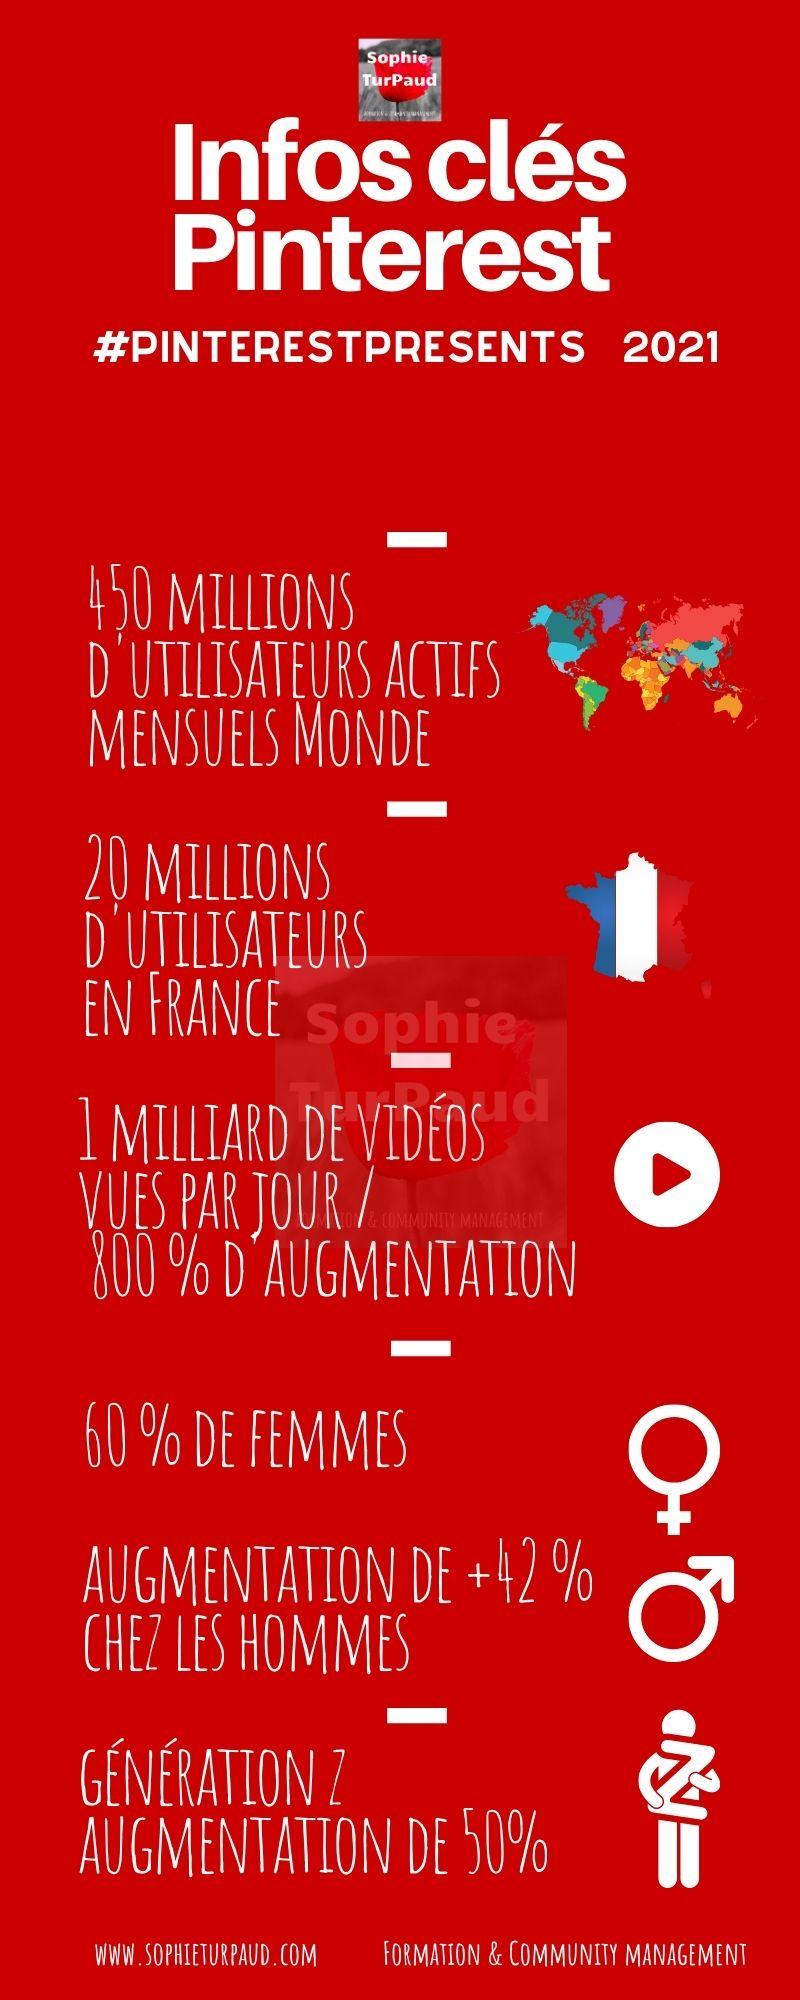 Infographie  Infos clés Pinterest #PinterestPresents 2021 via @sophieturpaud